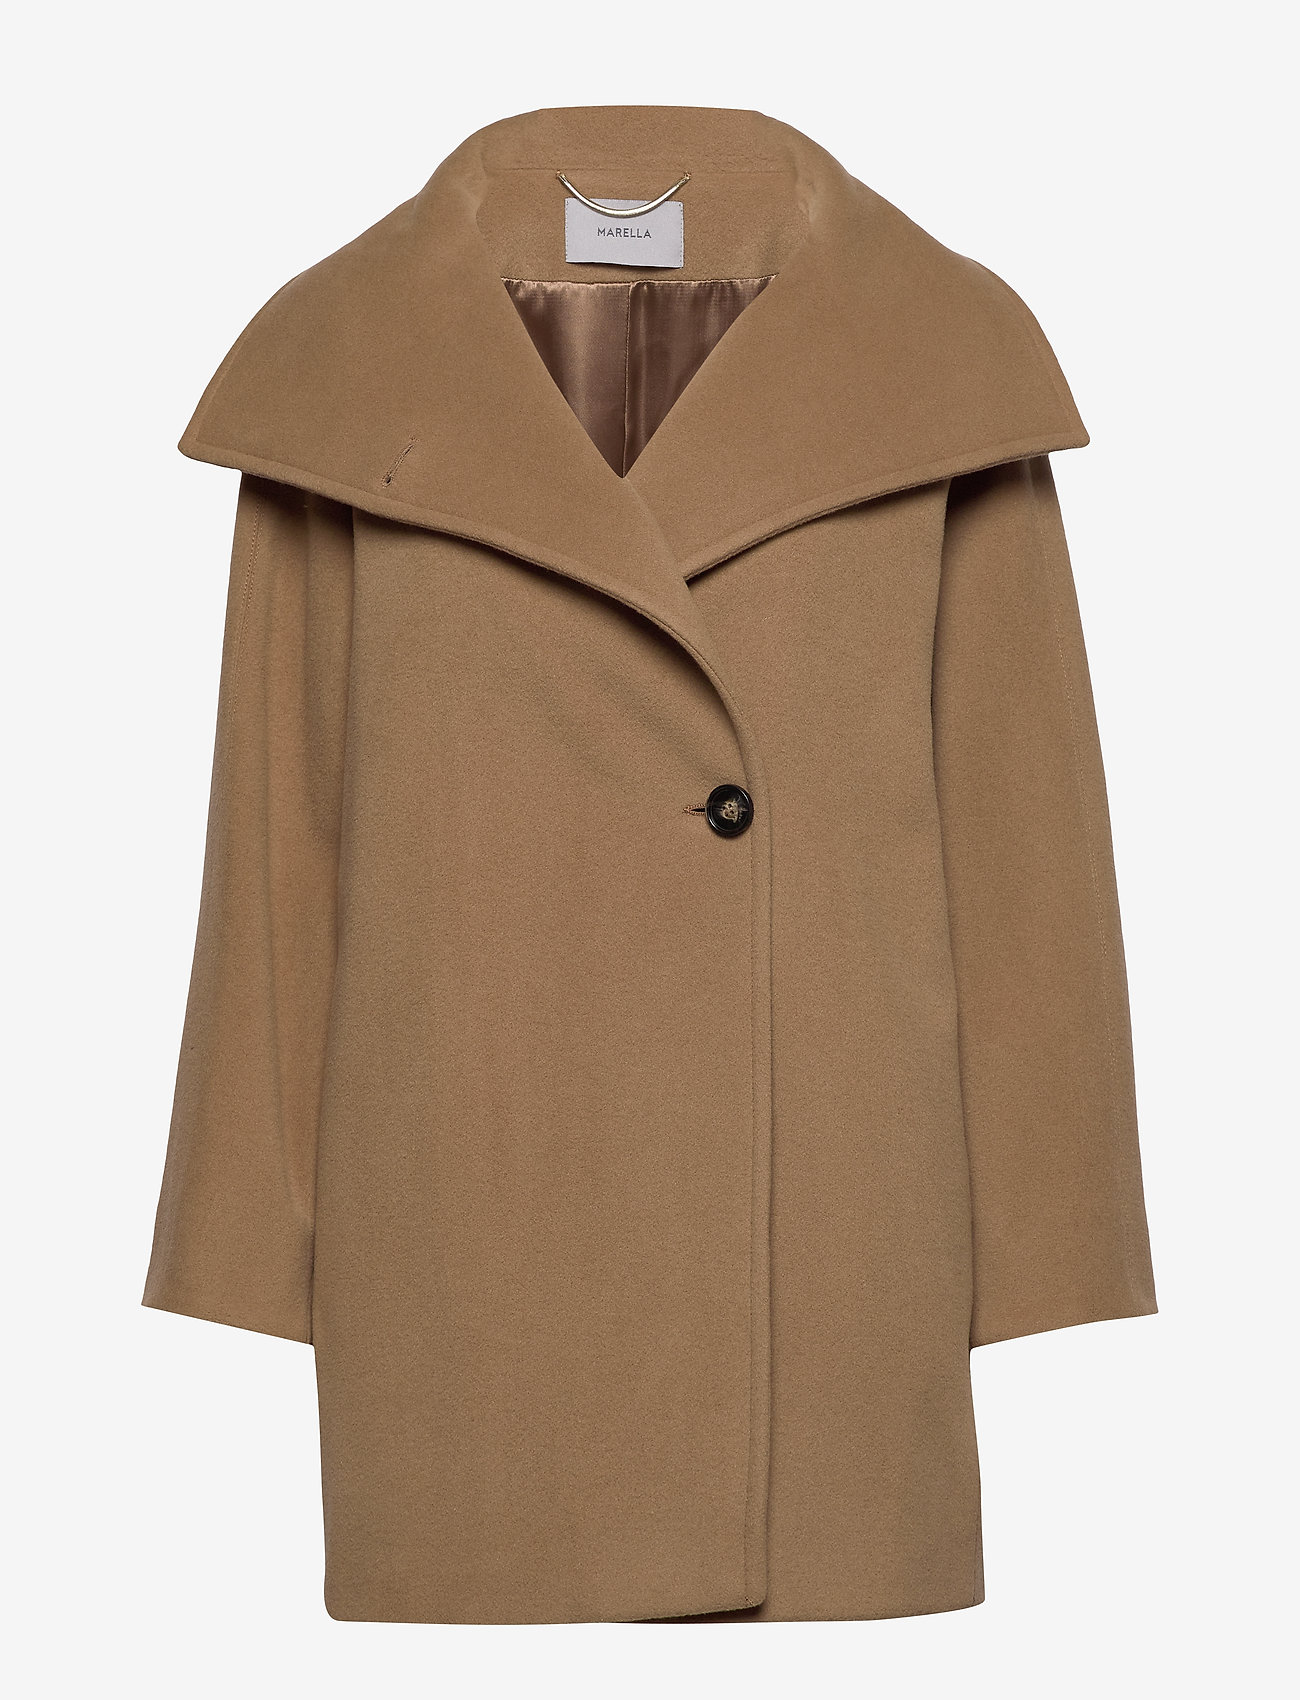 Marella - ENERGY - wool jackets - camel - 0